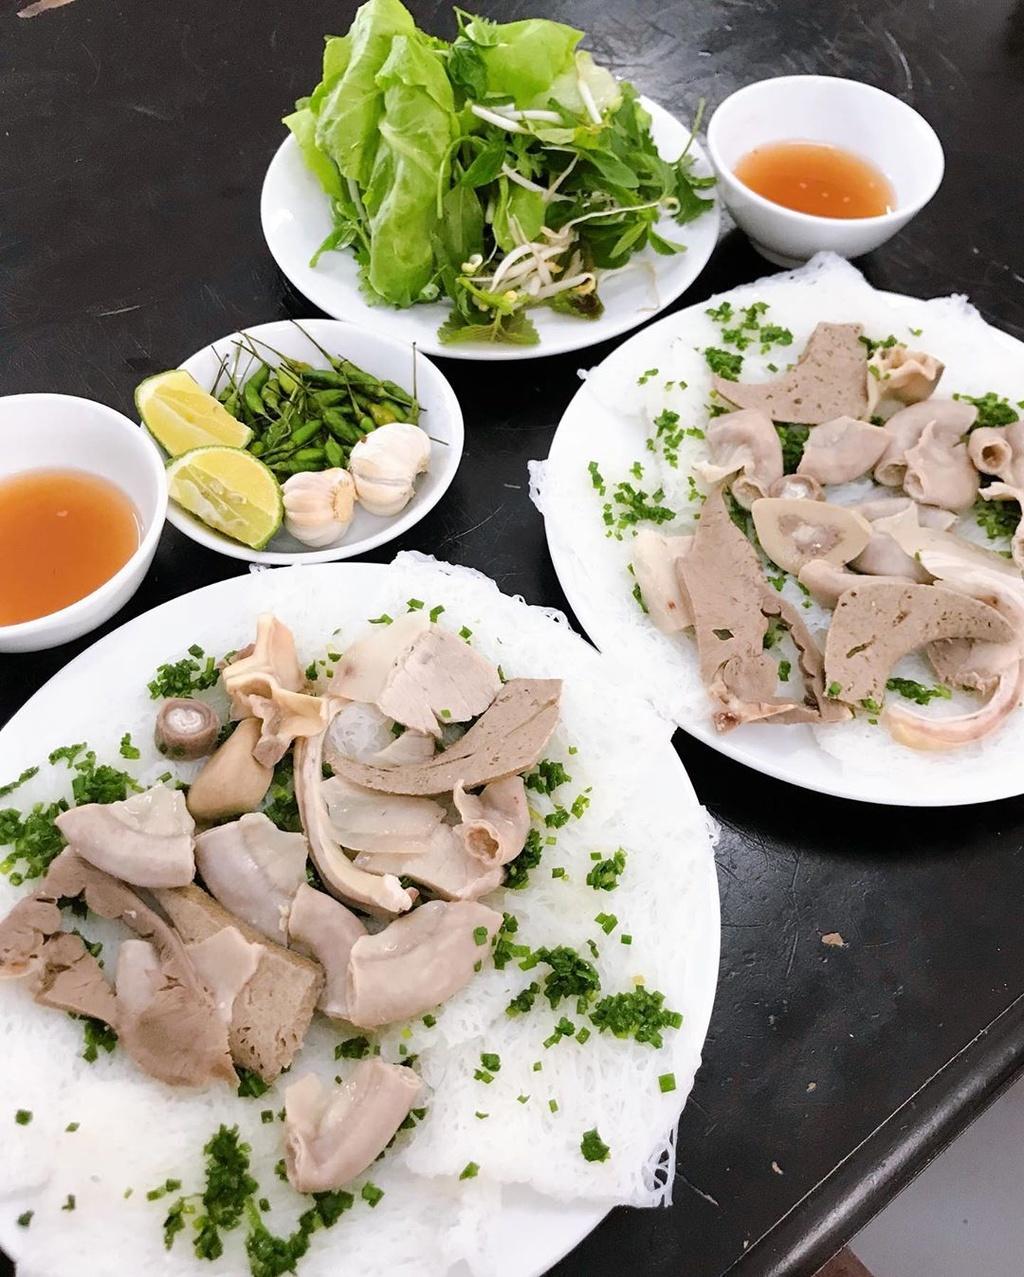 Mat ca ngu dai duong va loat mon ngon khong nen bo qua tai Phu Yen hinh anh 12 peachy_foody.jpg